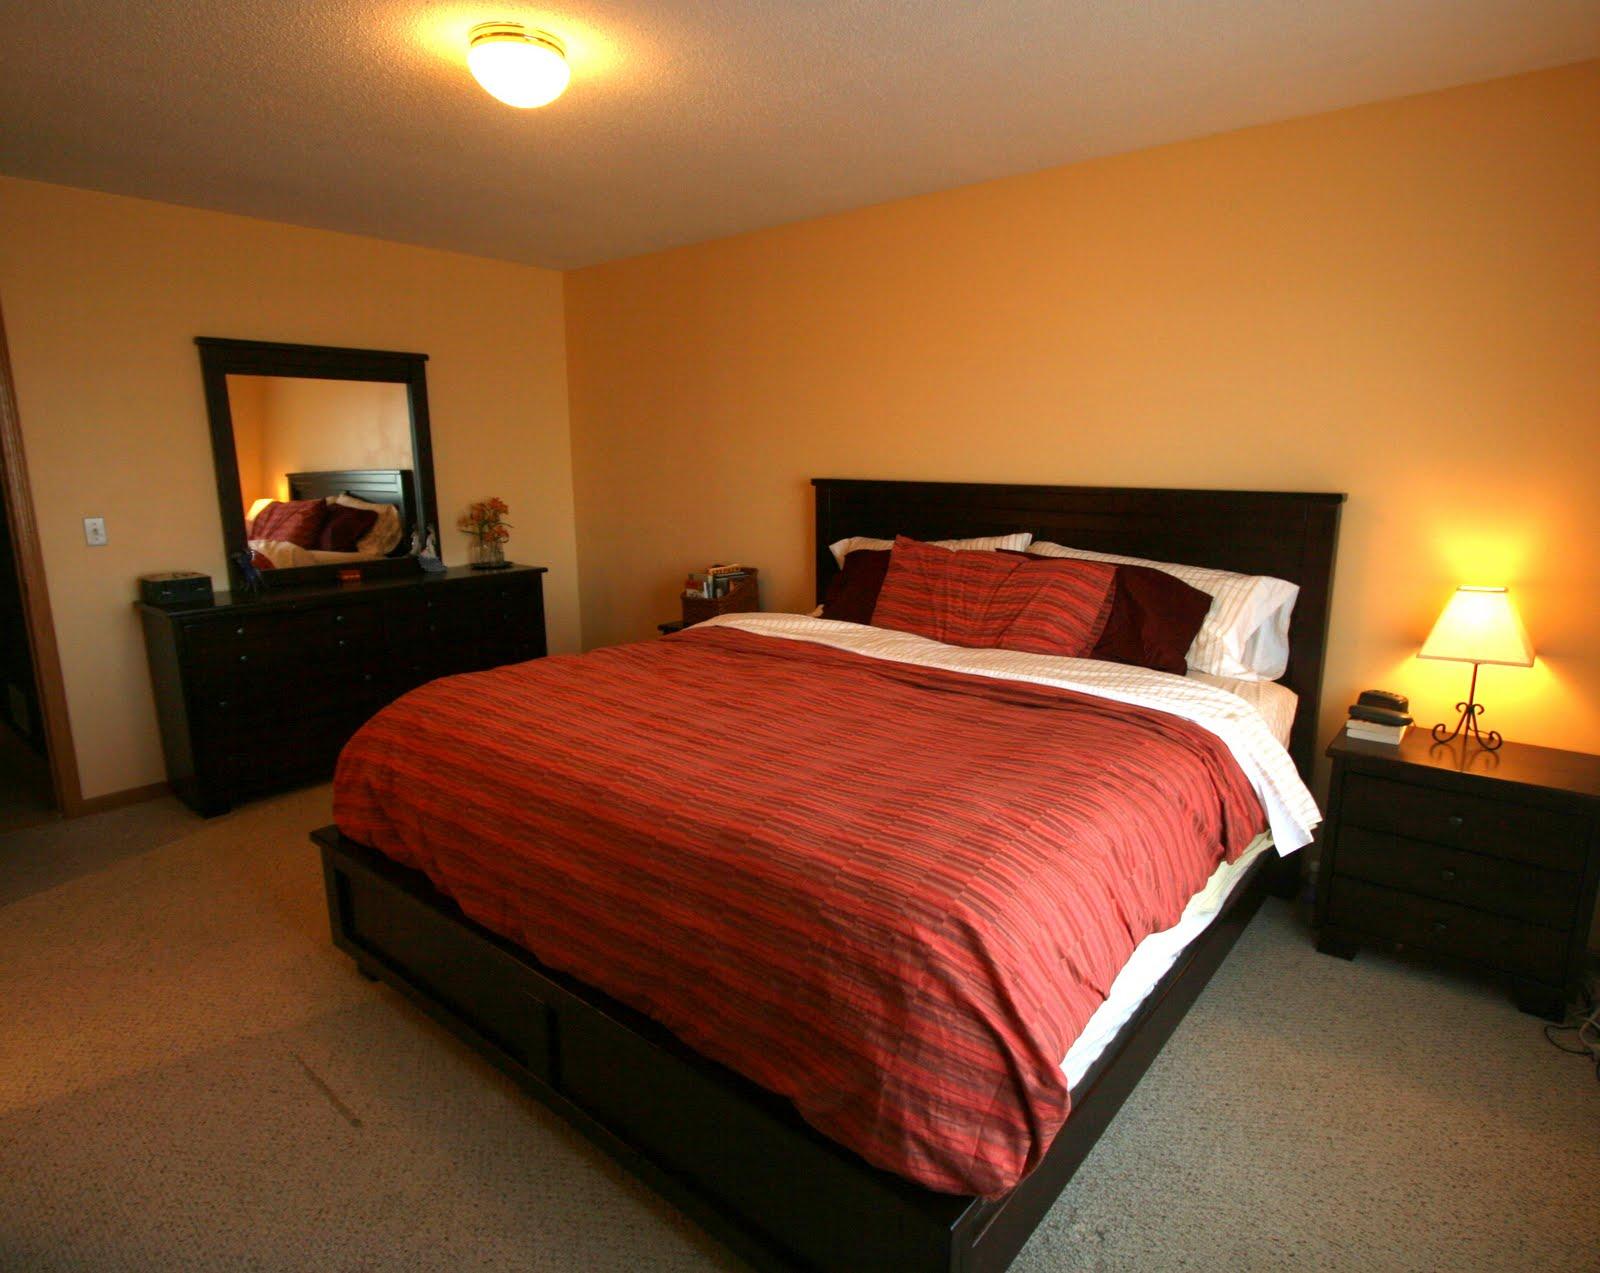 New bedroom furniture bernier isms random thoughts for Latest bedroom